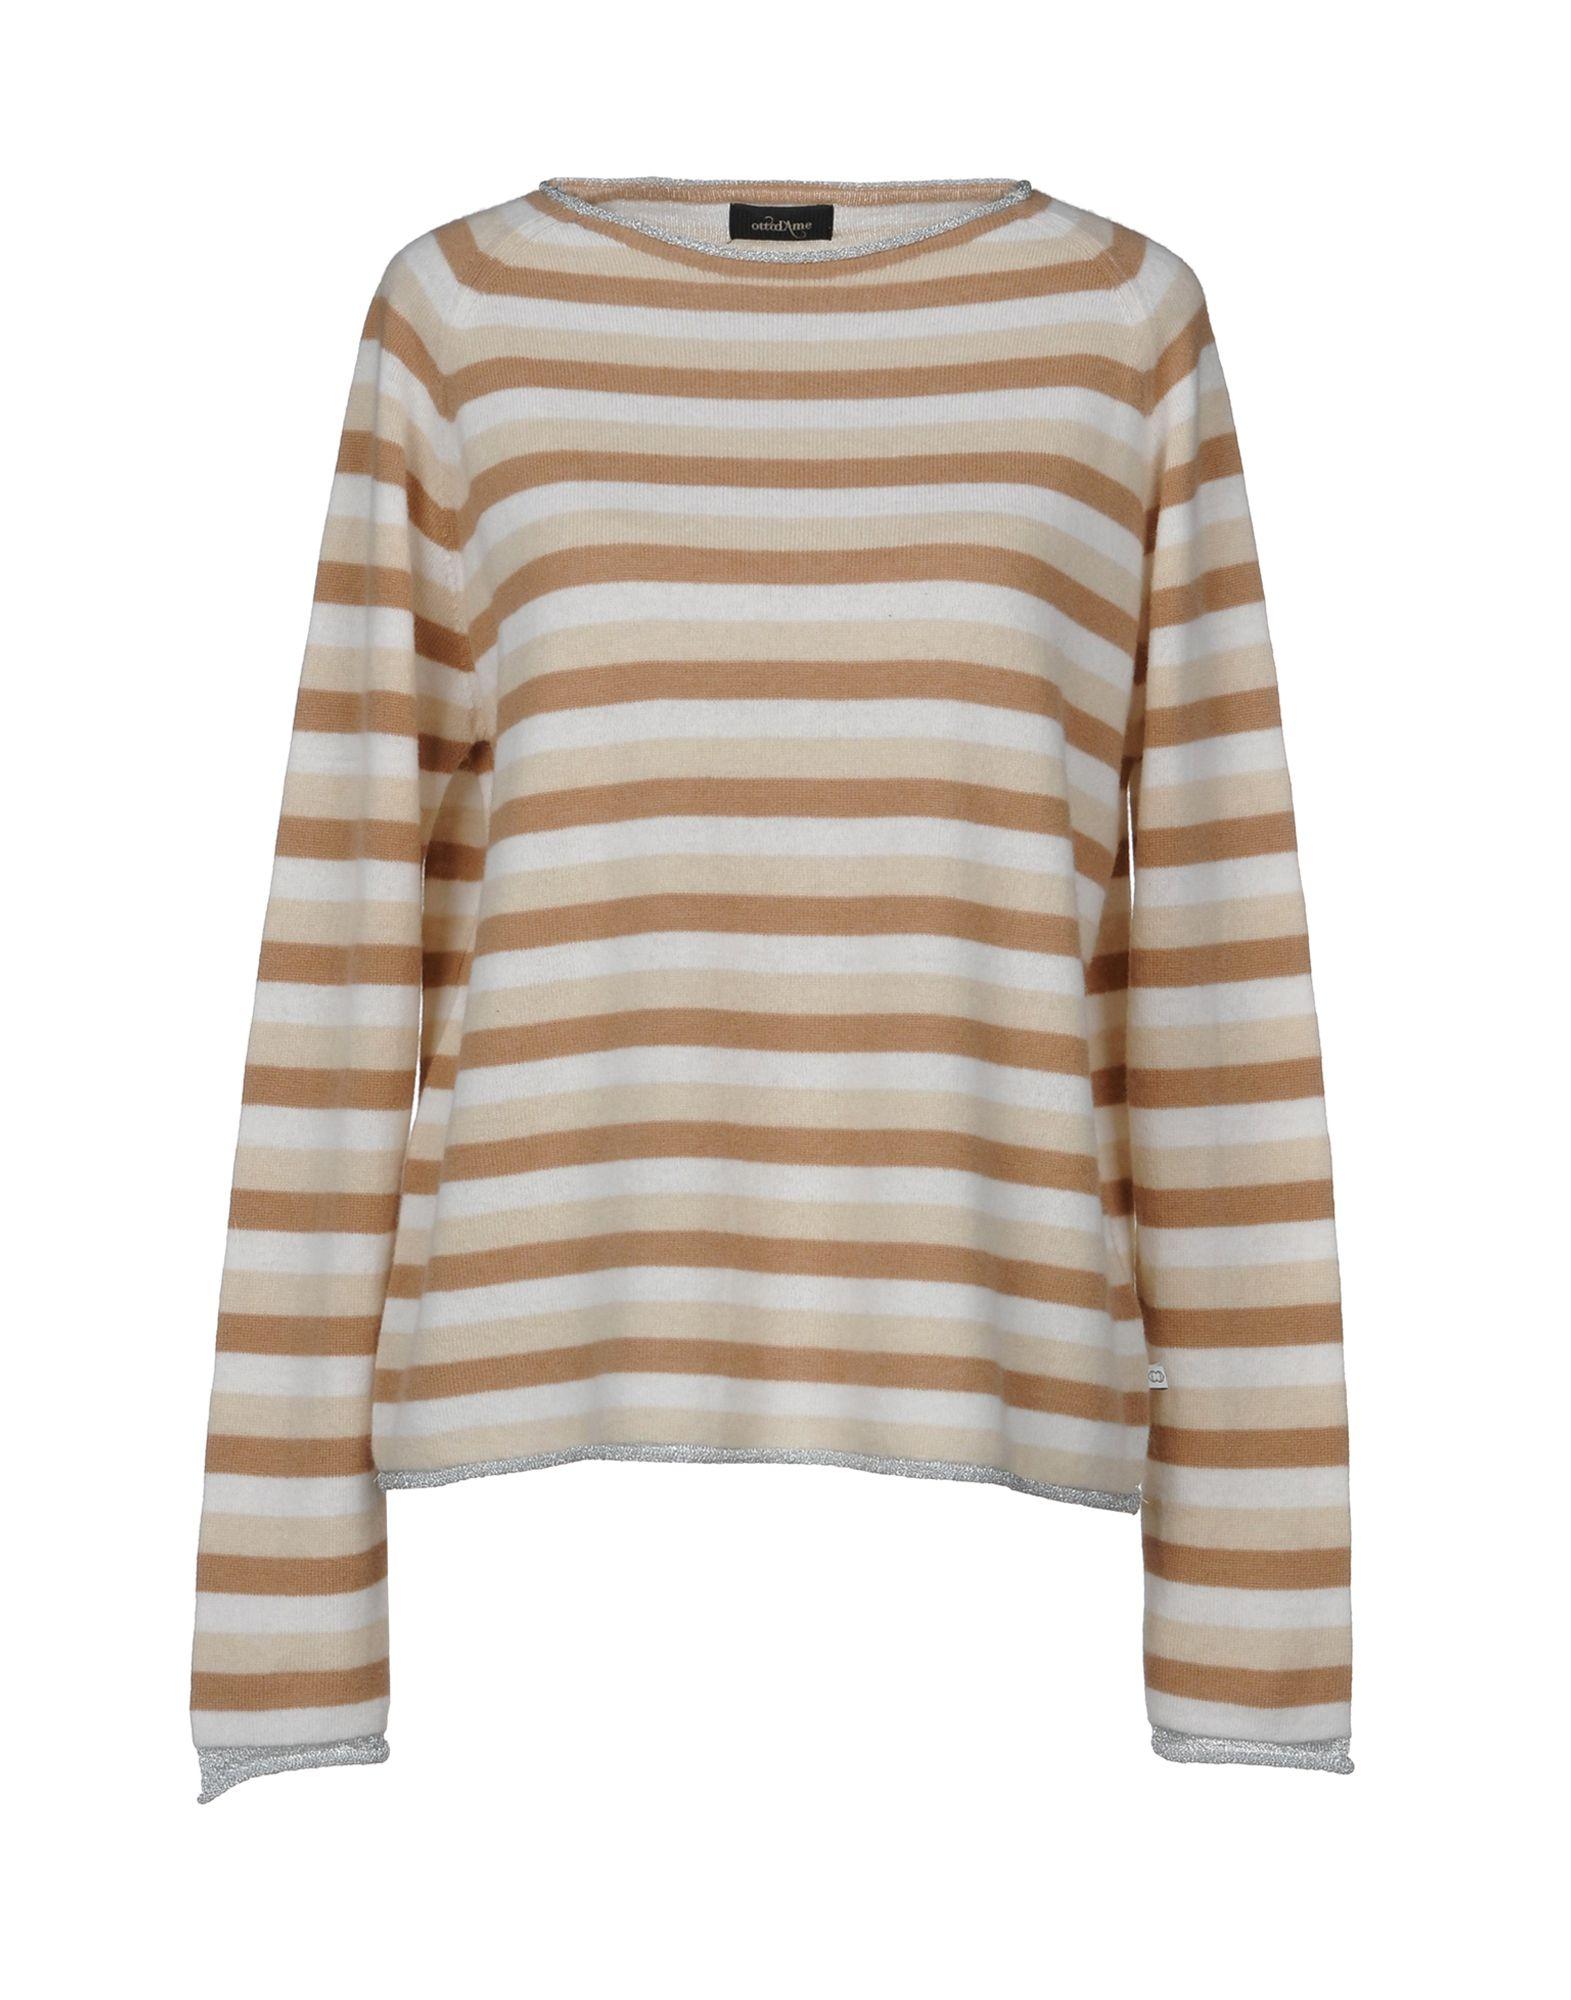 Pullover Ottod'ame Donna - Acquista online su IDJH3X4ISc